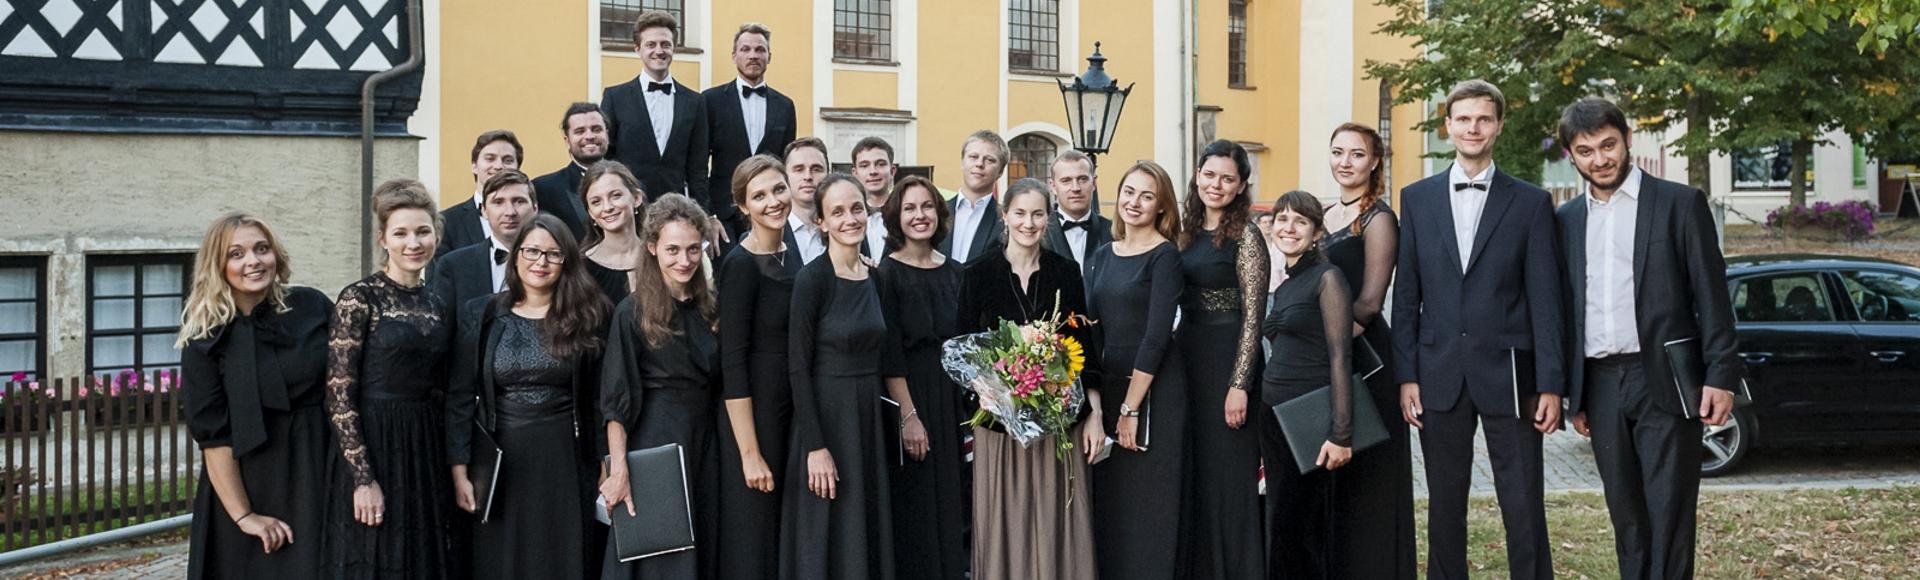 «молодое хоровое чудо».Екатерина Бирюкова, colta.ru